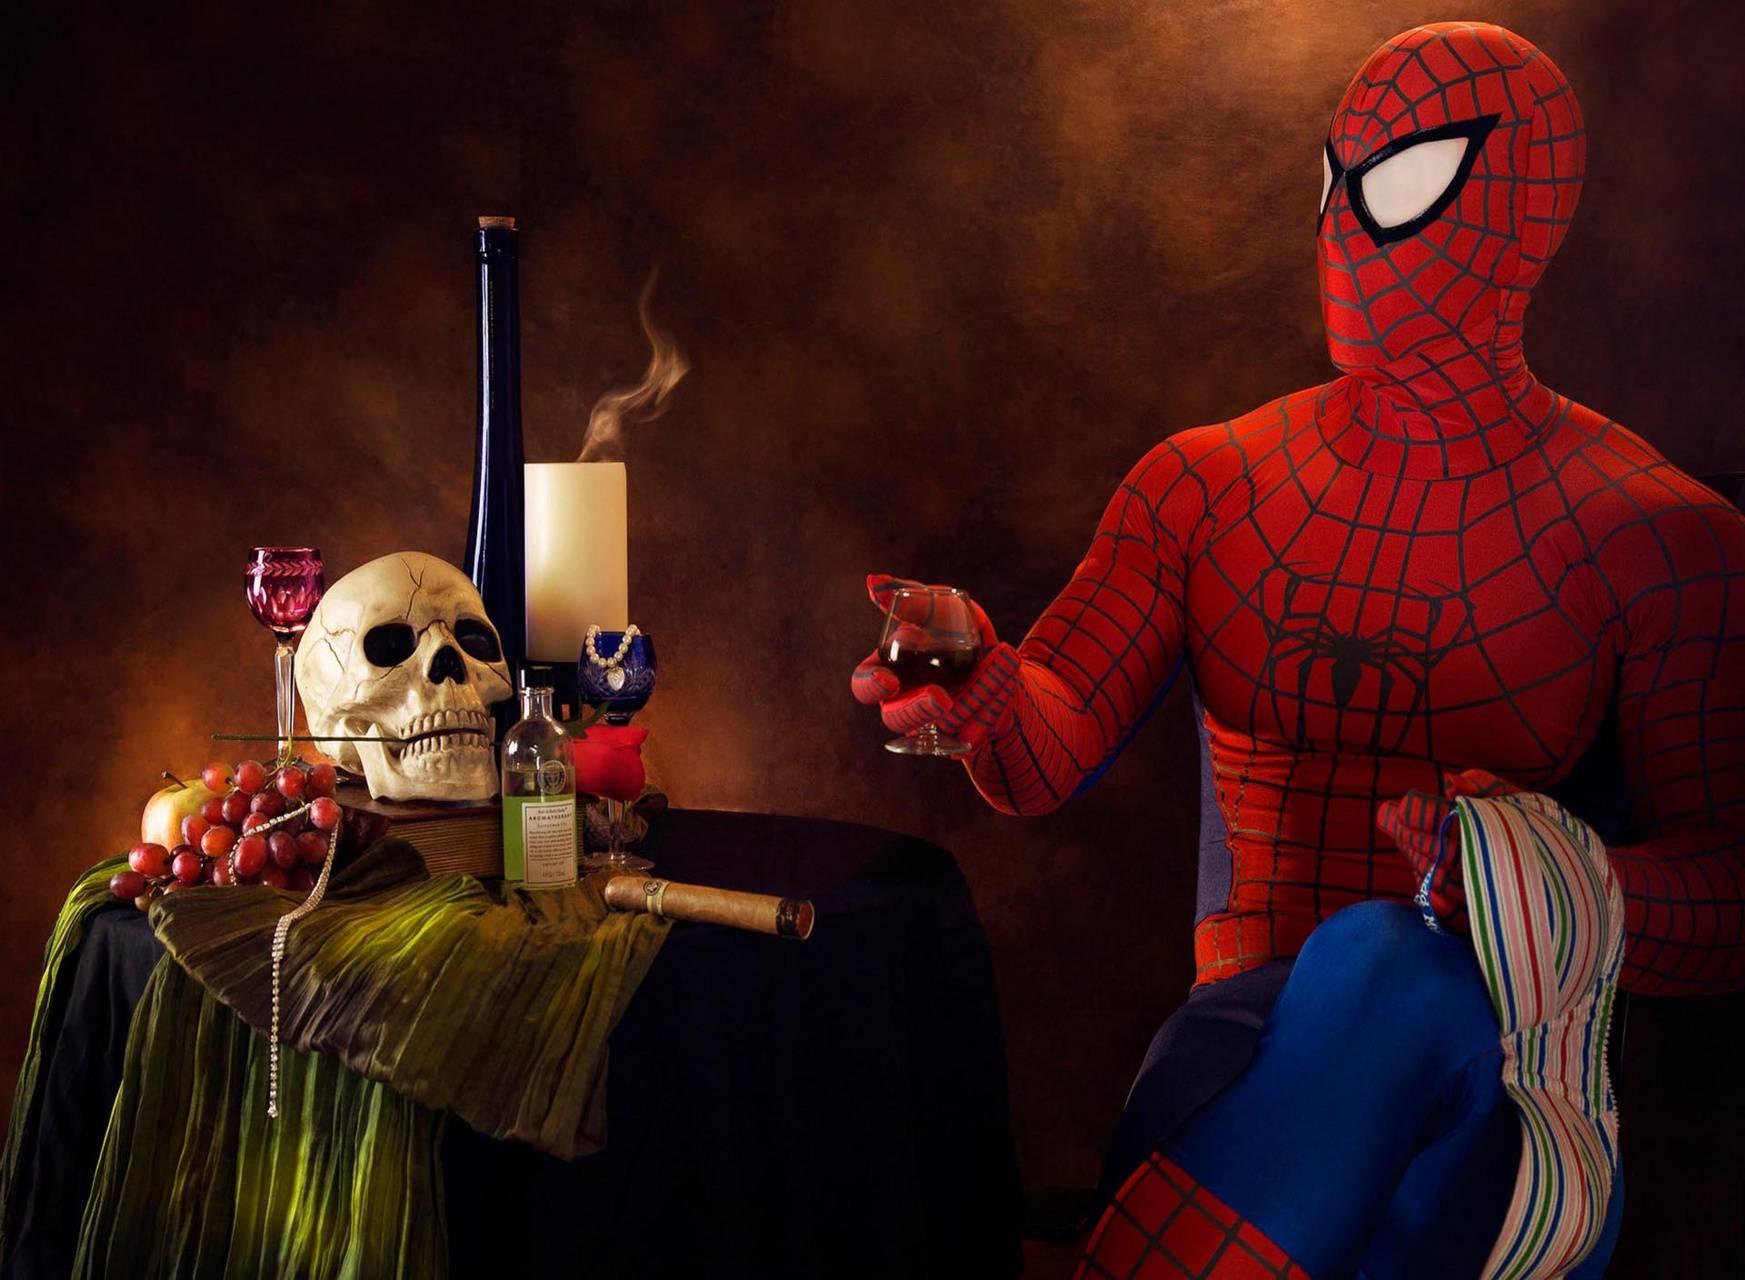 Spiderman N skull